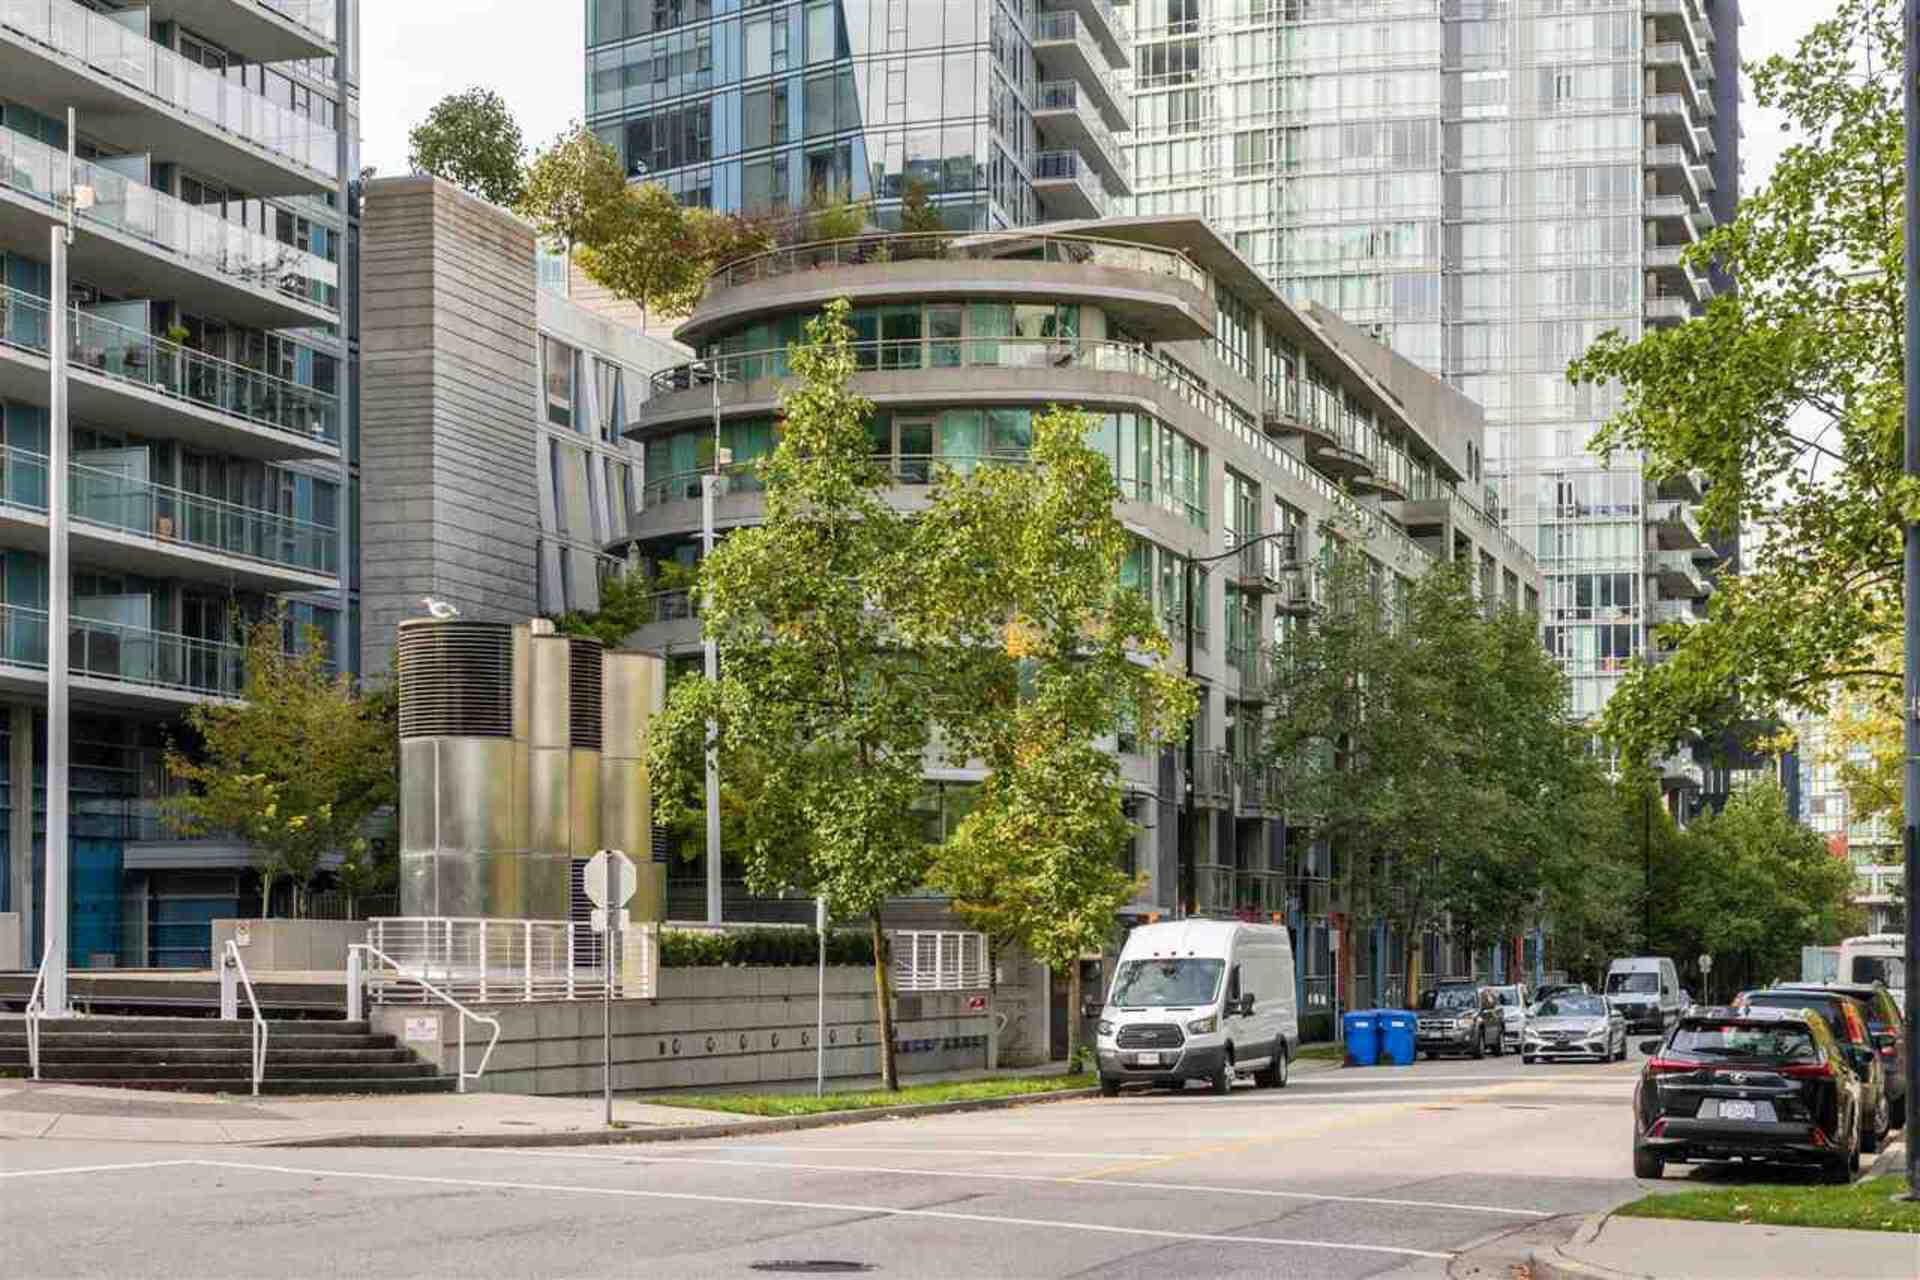 1418-w-hastings-street-coal-harbour-vancouver-west-38 at 1418 W Hastings Street, Coal Harbour, Vancouver West